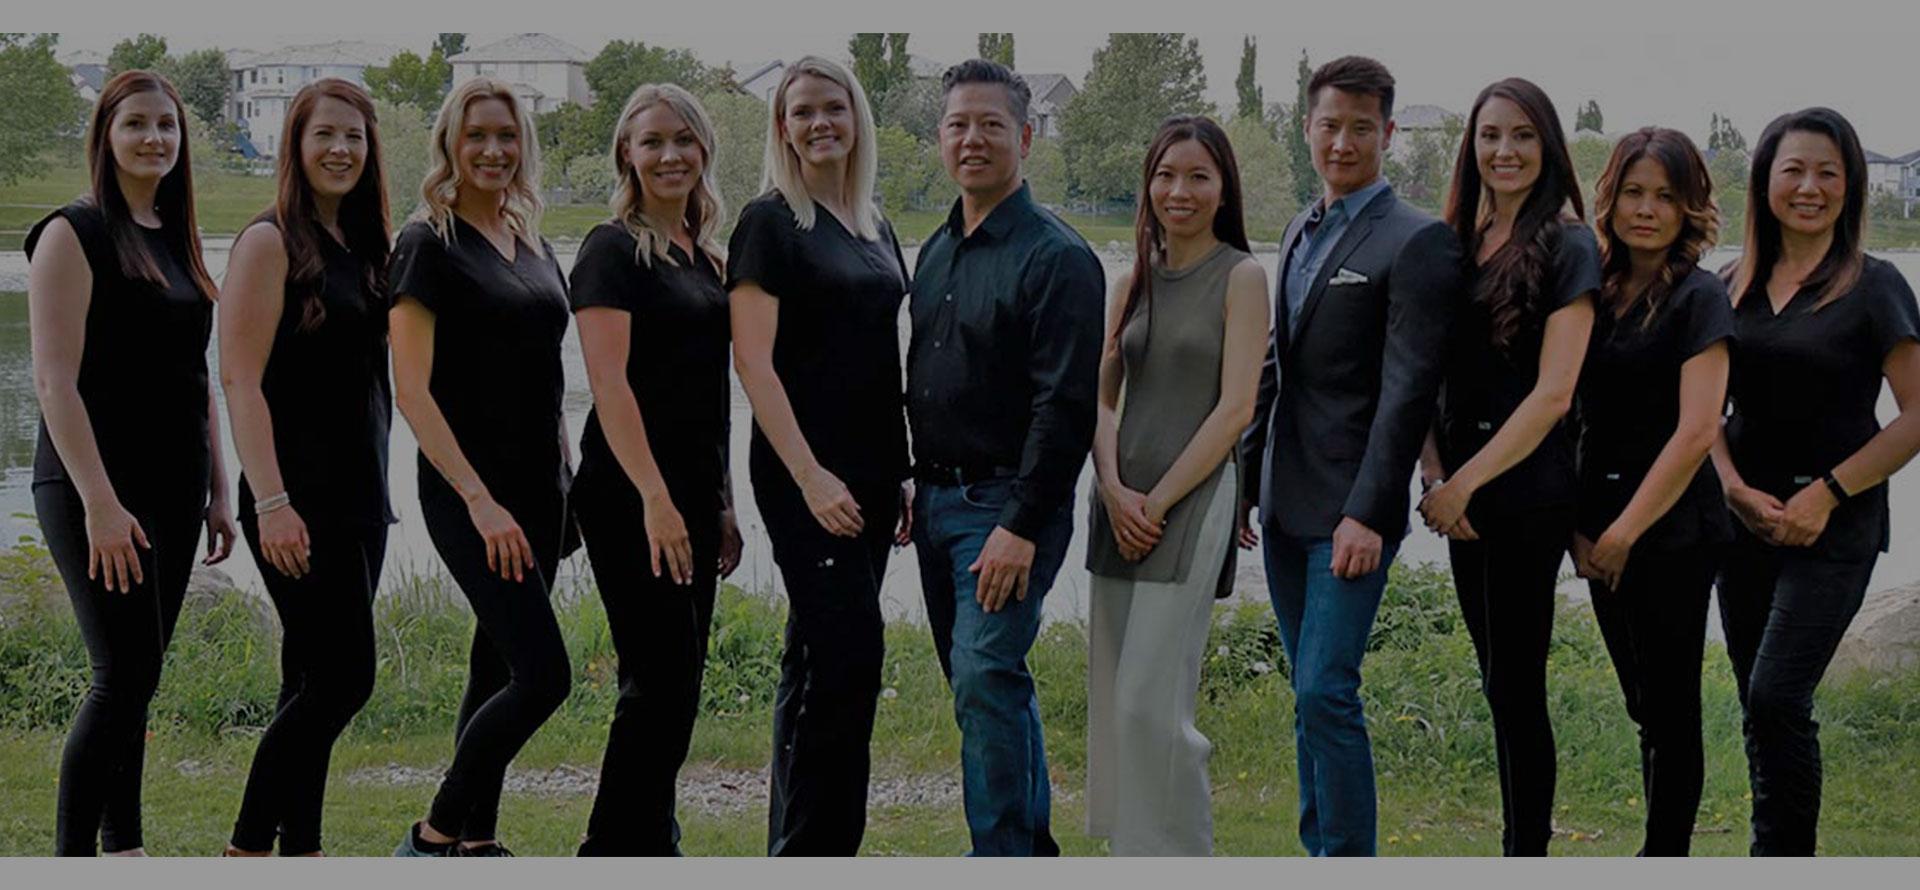 Meet the Friendly Dental Team | Paramount Dental | North Calgary | Family and General Dentist